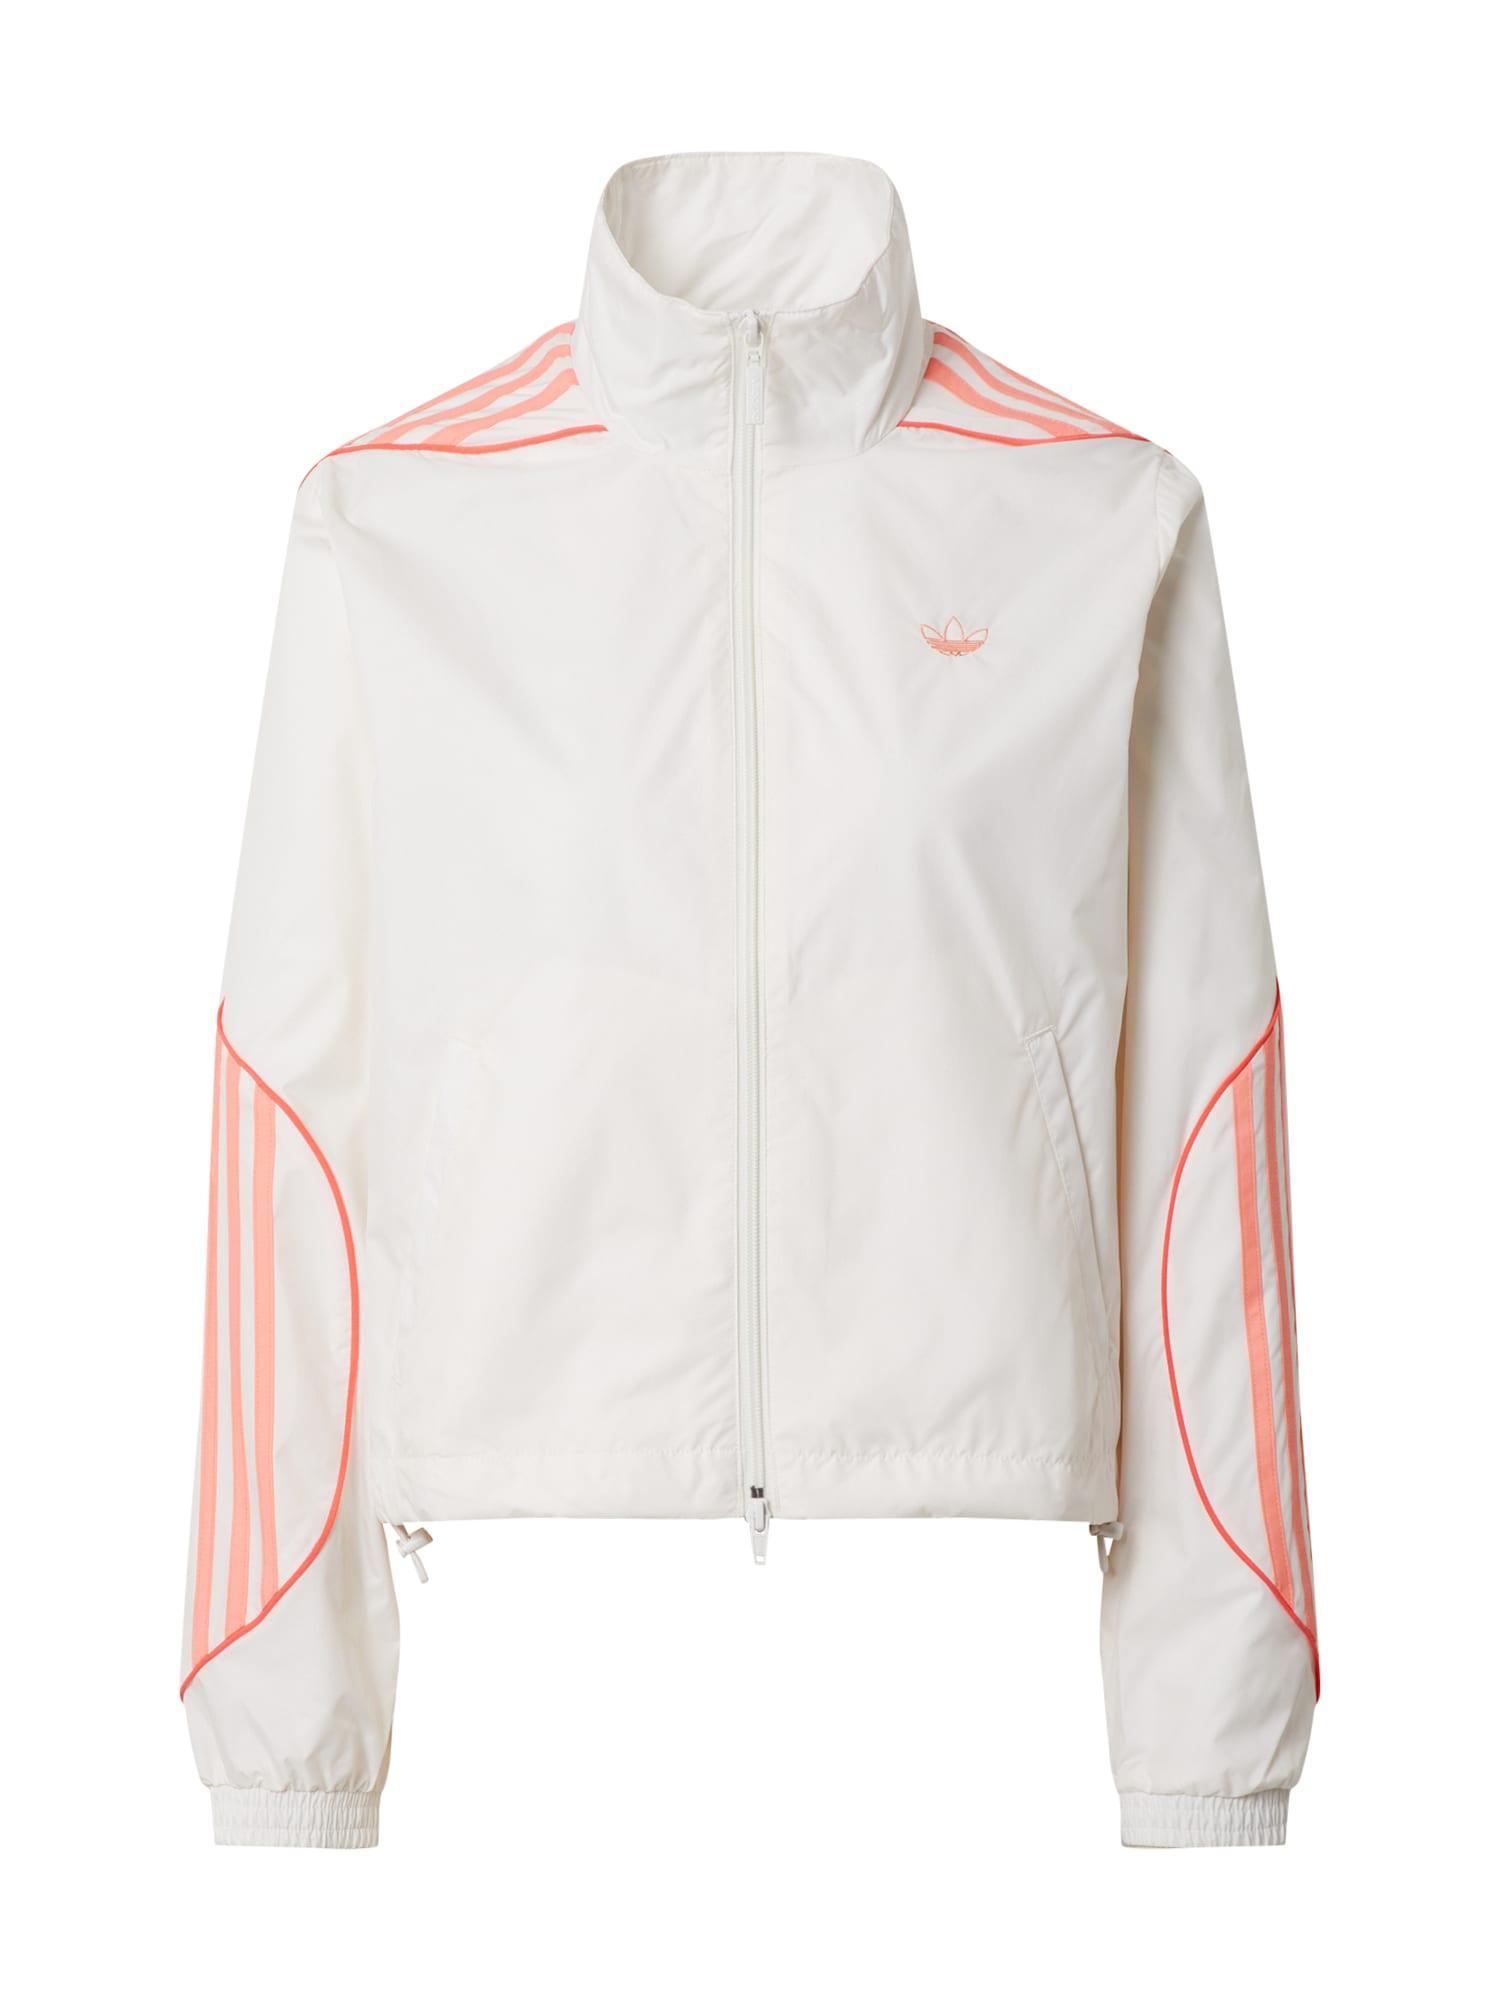 ADIDAS ORIGINALS Prechodná bunda 'Track Top'  biela / ružová